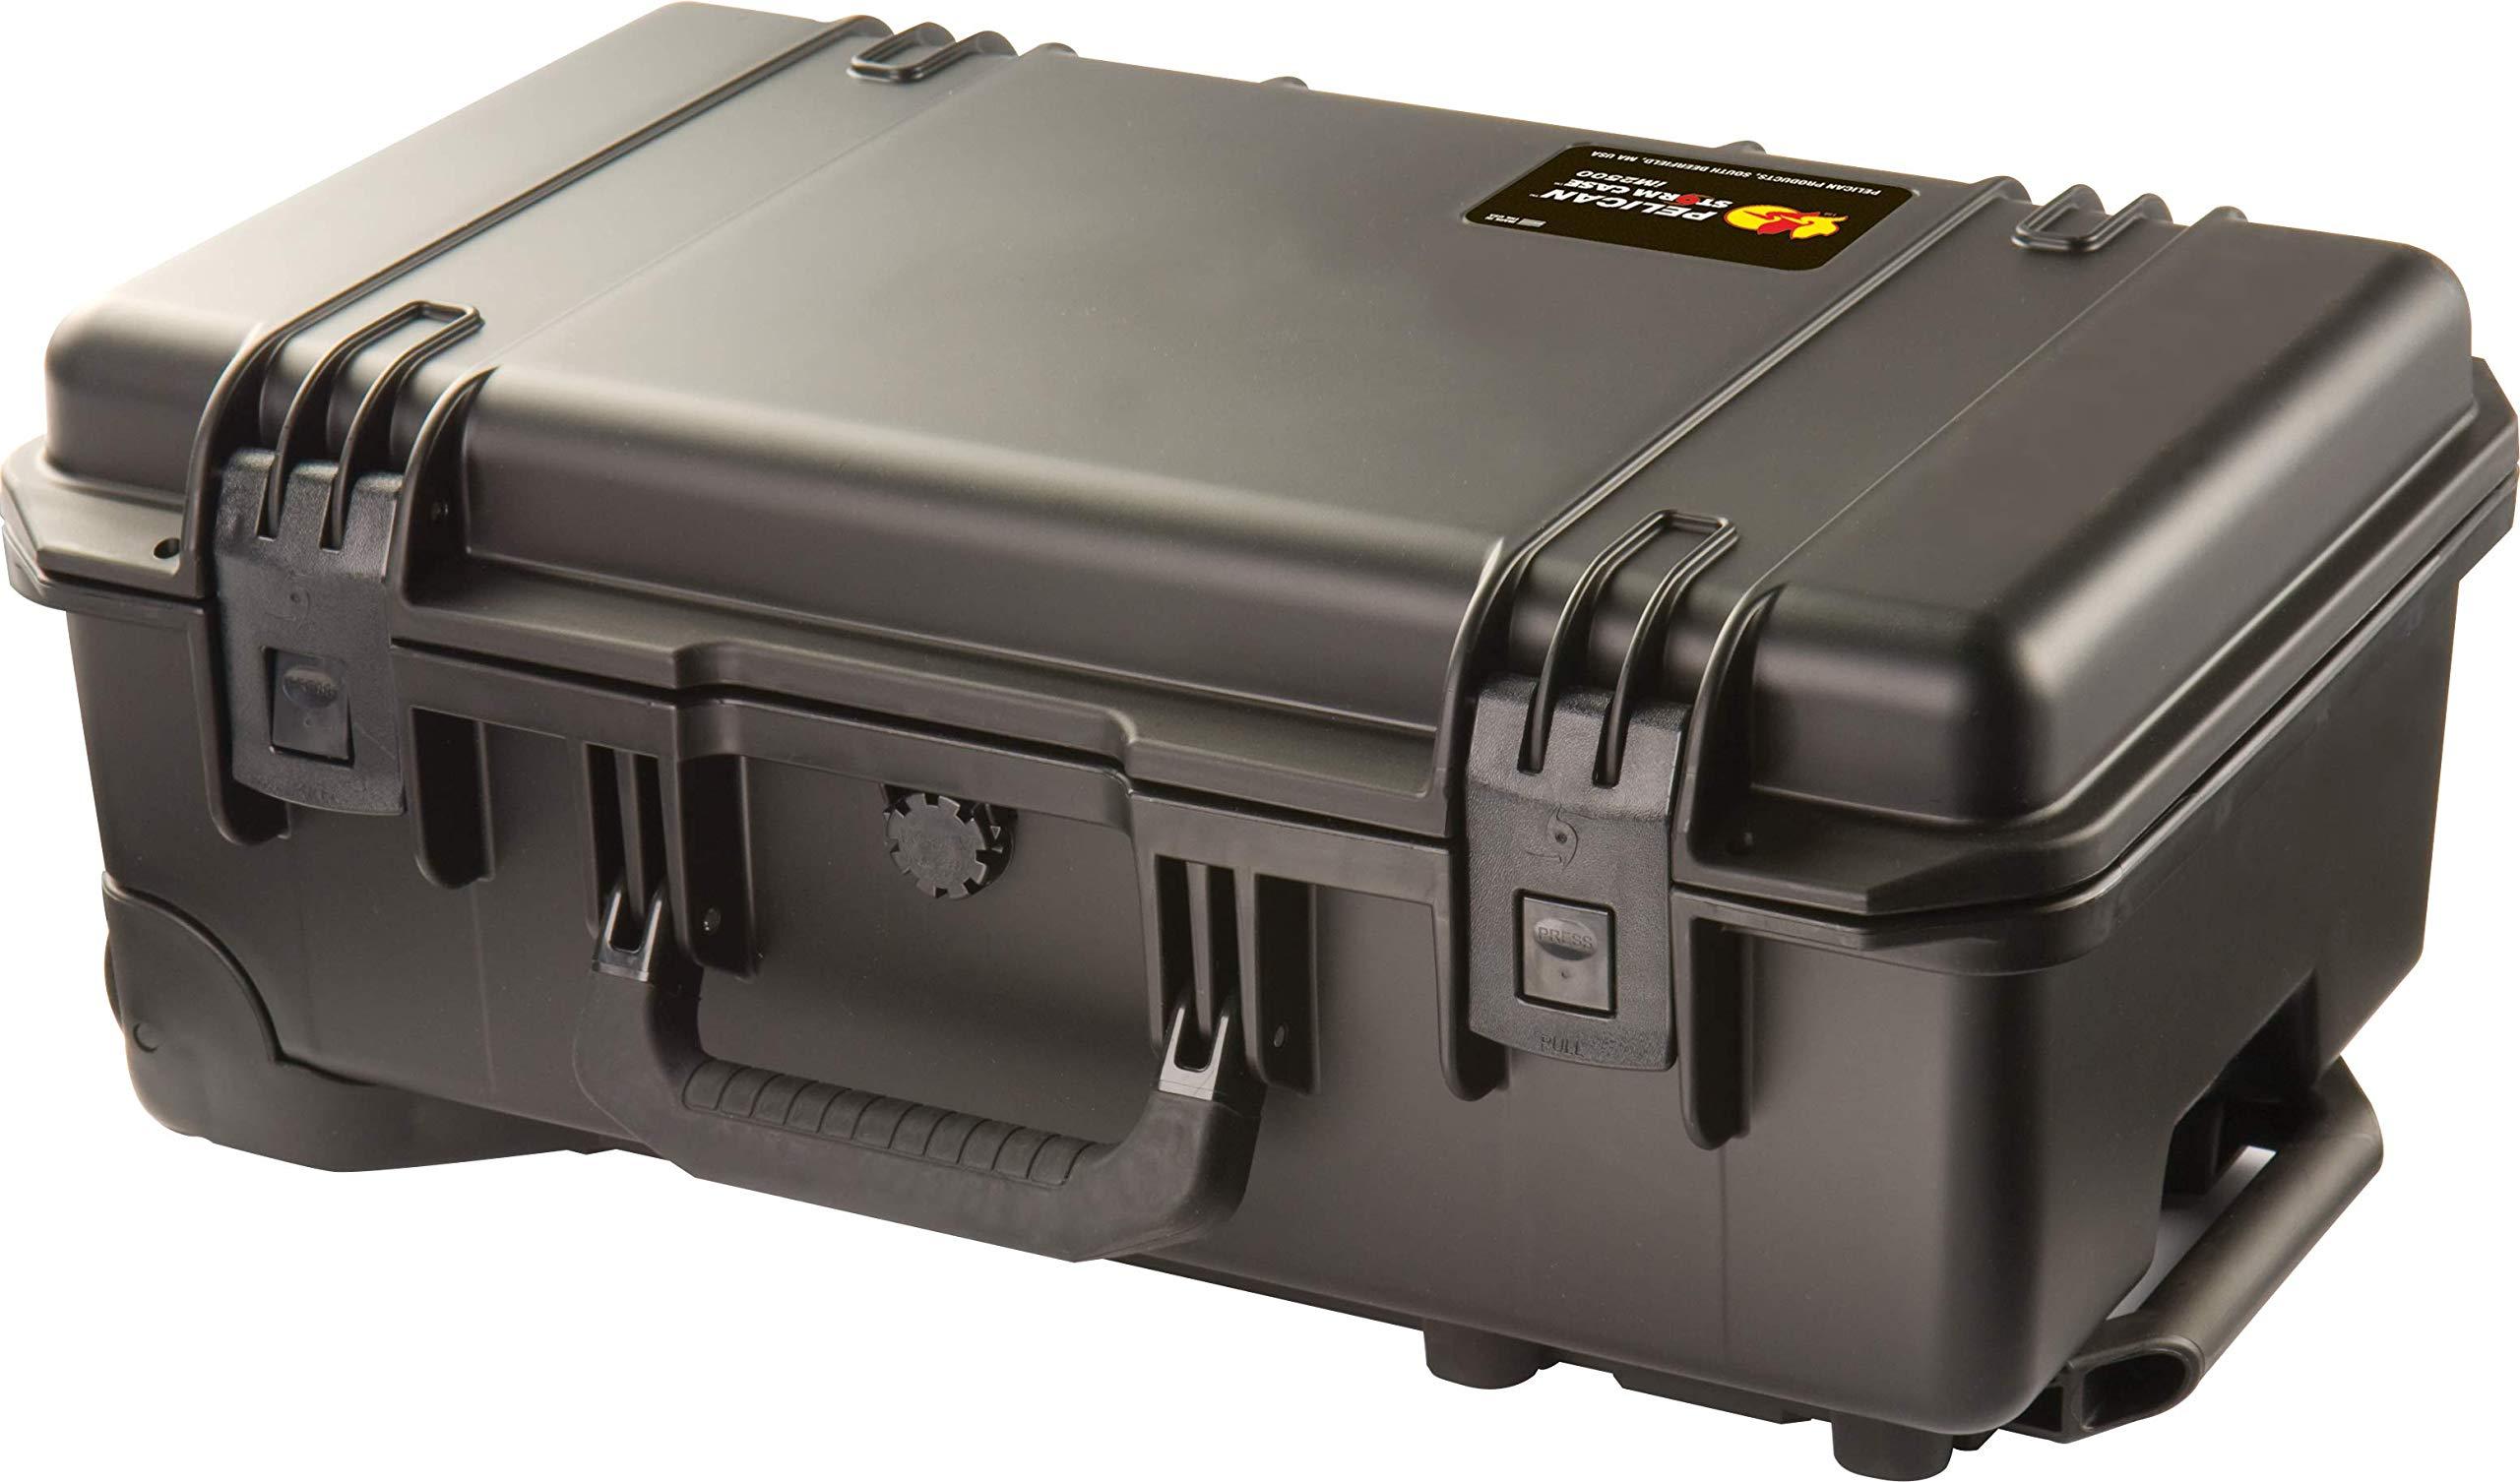 Waterproof Case (Dry Box) | Pelican Storm iM2500 Case With Foam (Black)